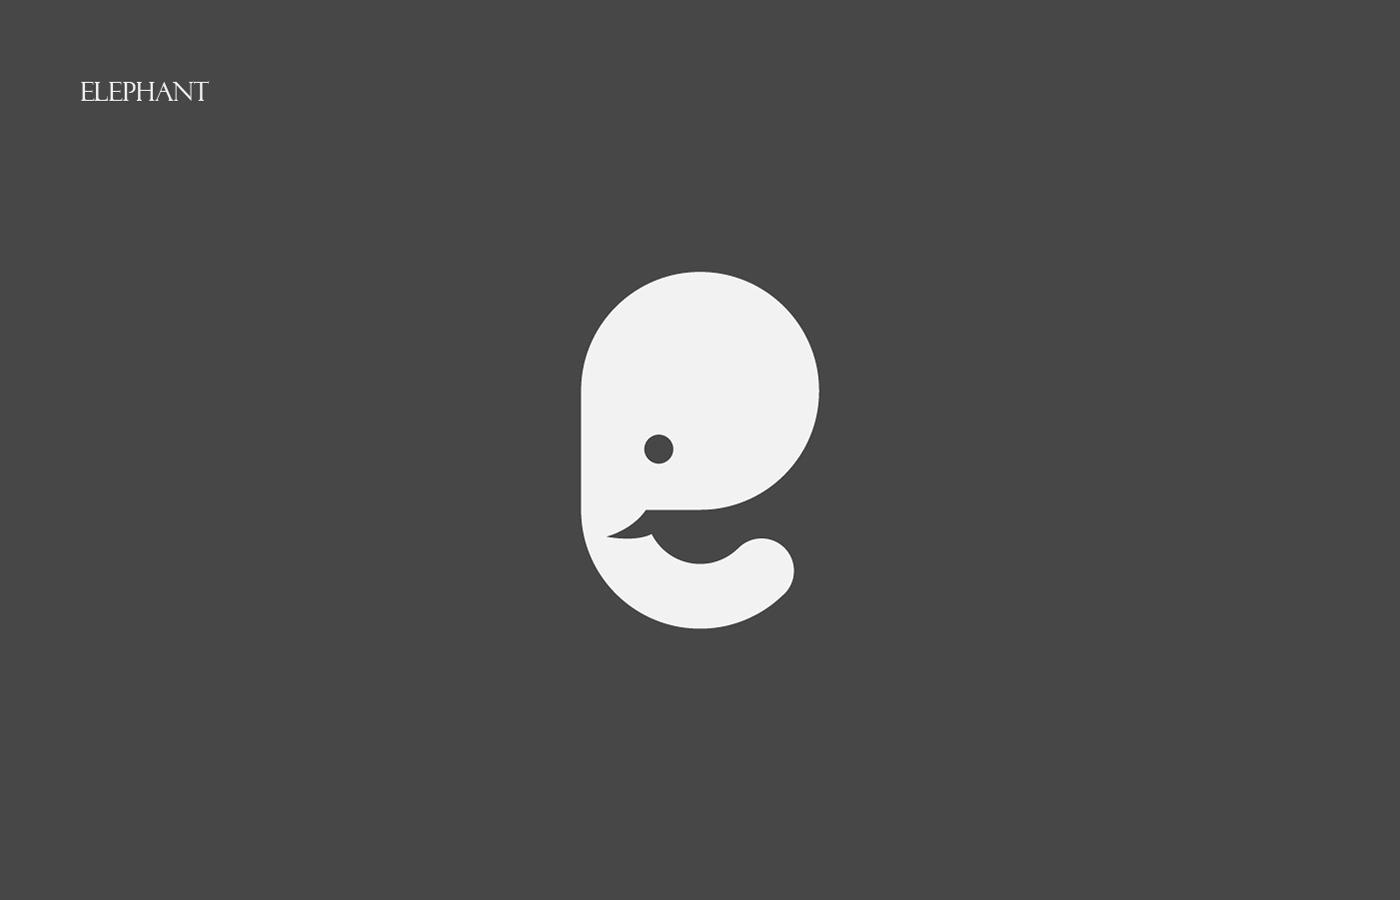 animals alphabet letters 36daysoftype logo type creative colors lettering typographic ABC instagram symbol Saudi Kuwait